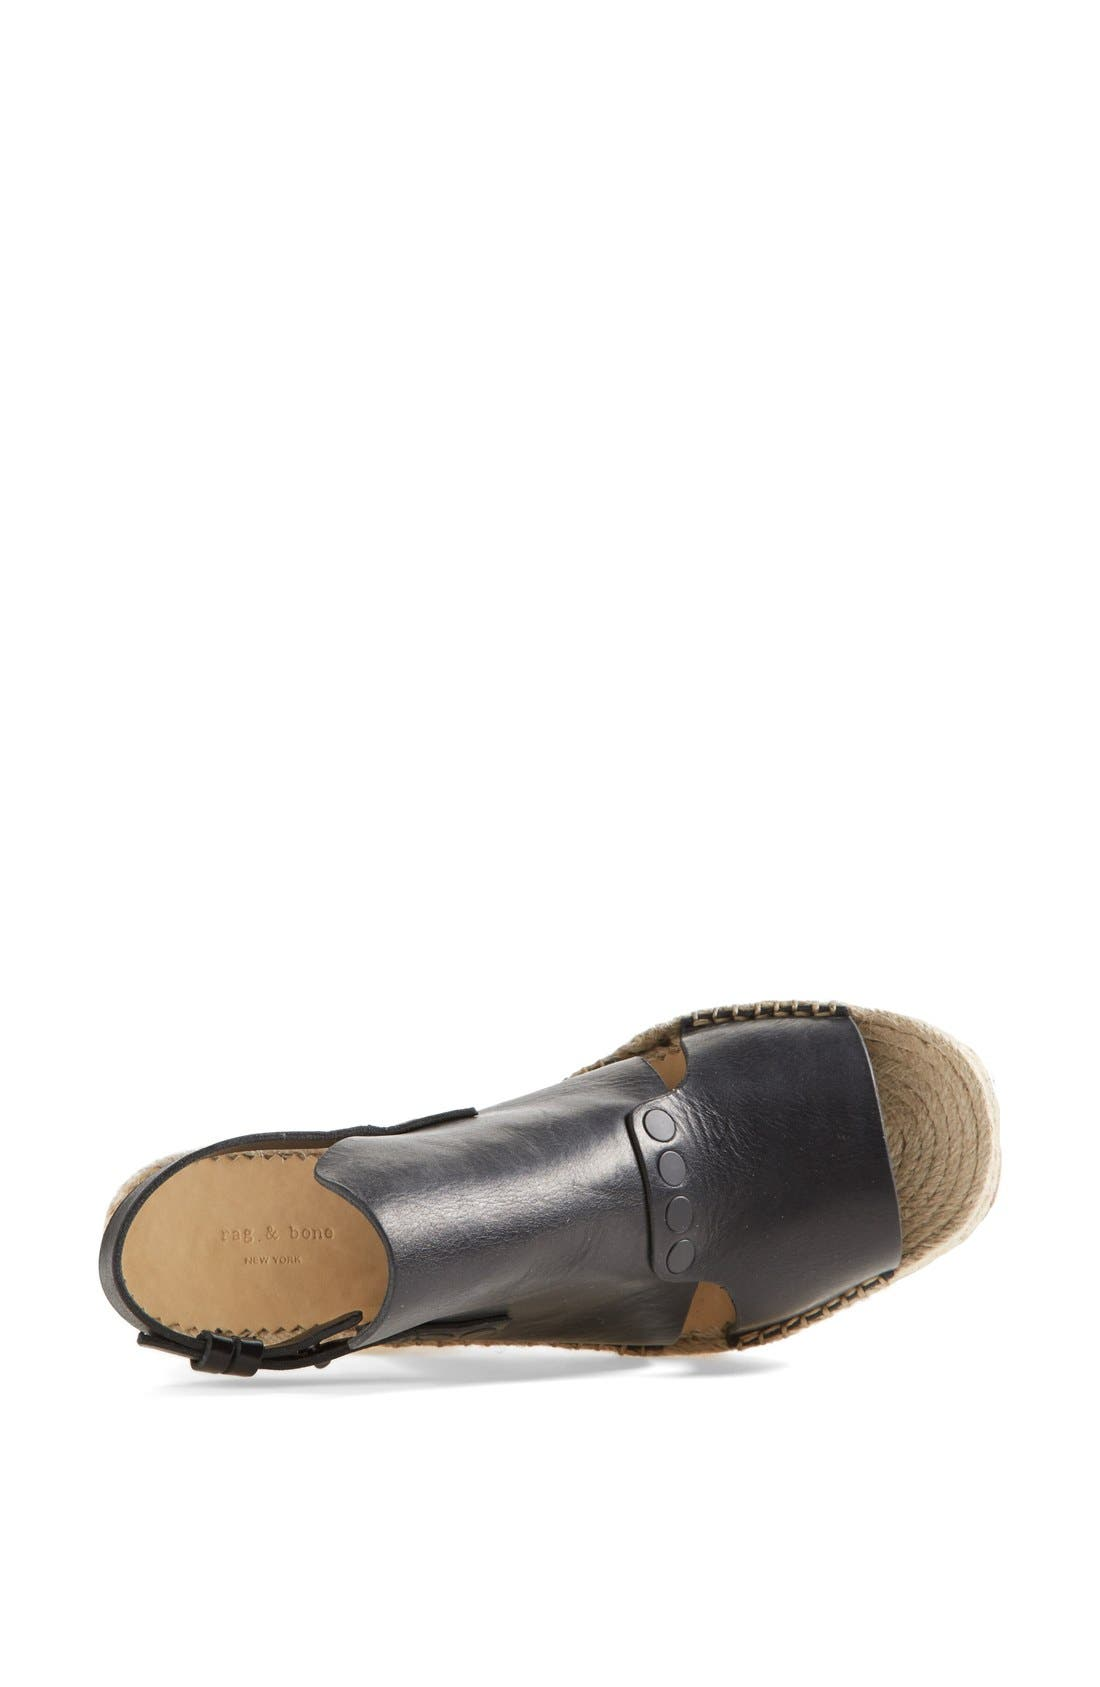 Alternate Image 3  - rag & bone 'Sayre II' Espadrille Wedge Sandal